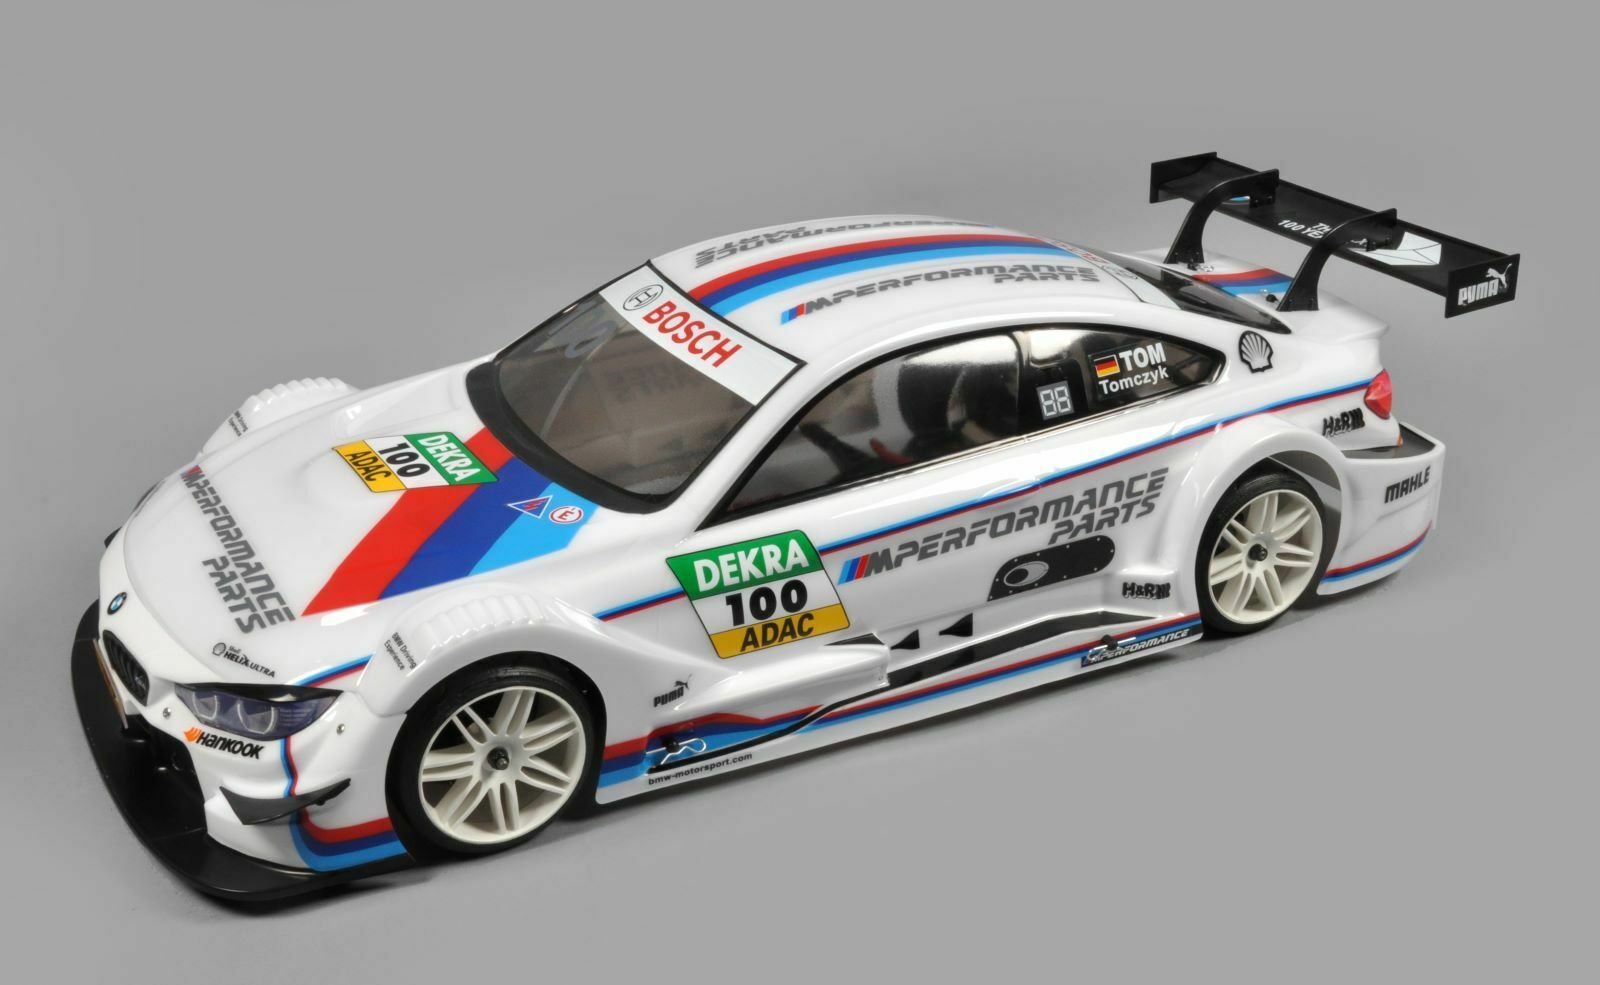 Fg 154100ERC Sportsline 4WD BMW M4 Elektro 530 Chassis lungo  Rtr  liquidazione